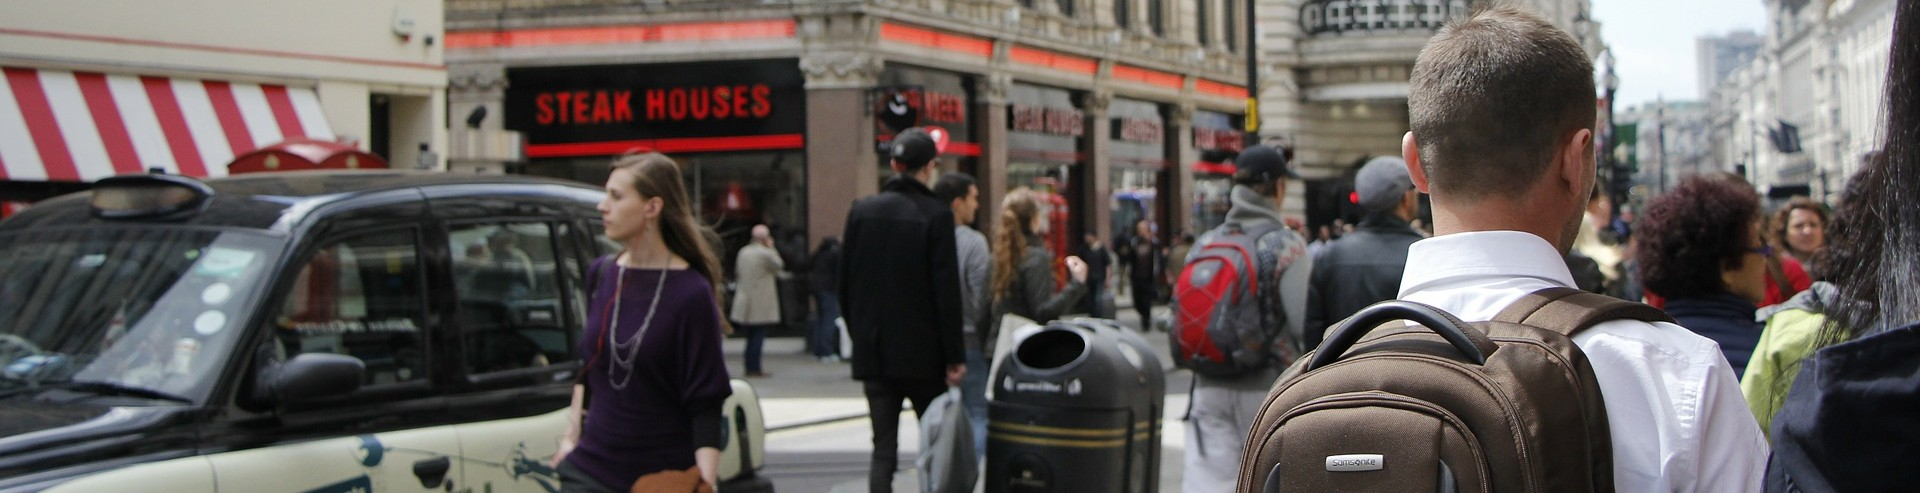 contractors walking through London city